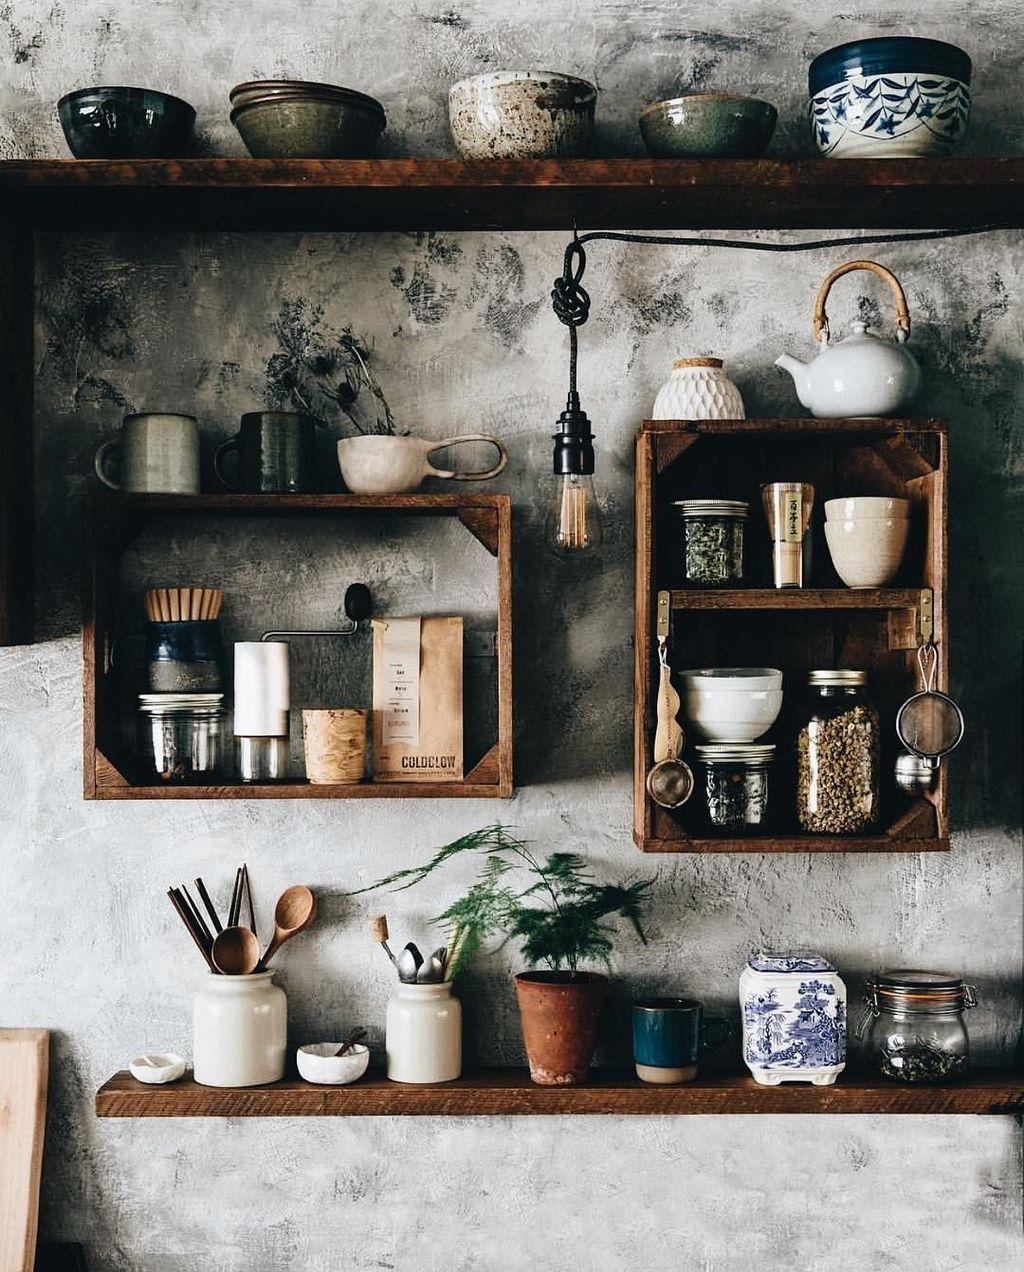 47 Cool Kitchen Decor Open Shelves Ideas Kitchen Kitchen Decor